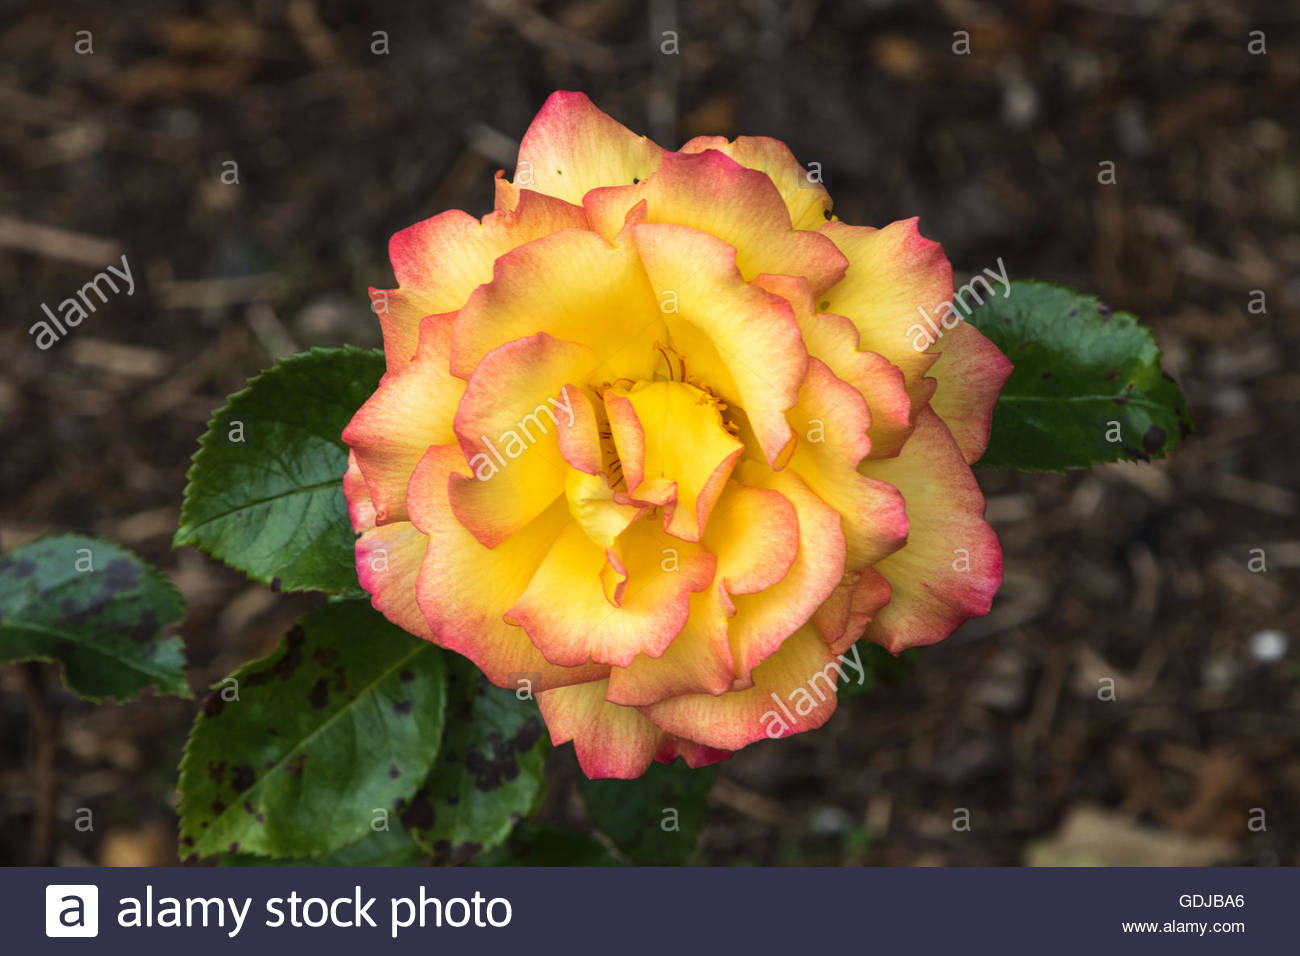 Floribunda rose blossom var. Sheila's Perfume - Stock Image